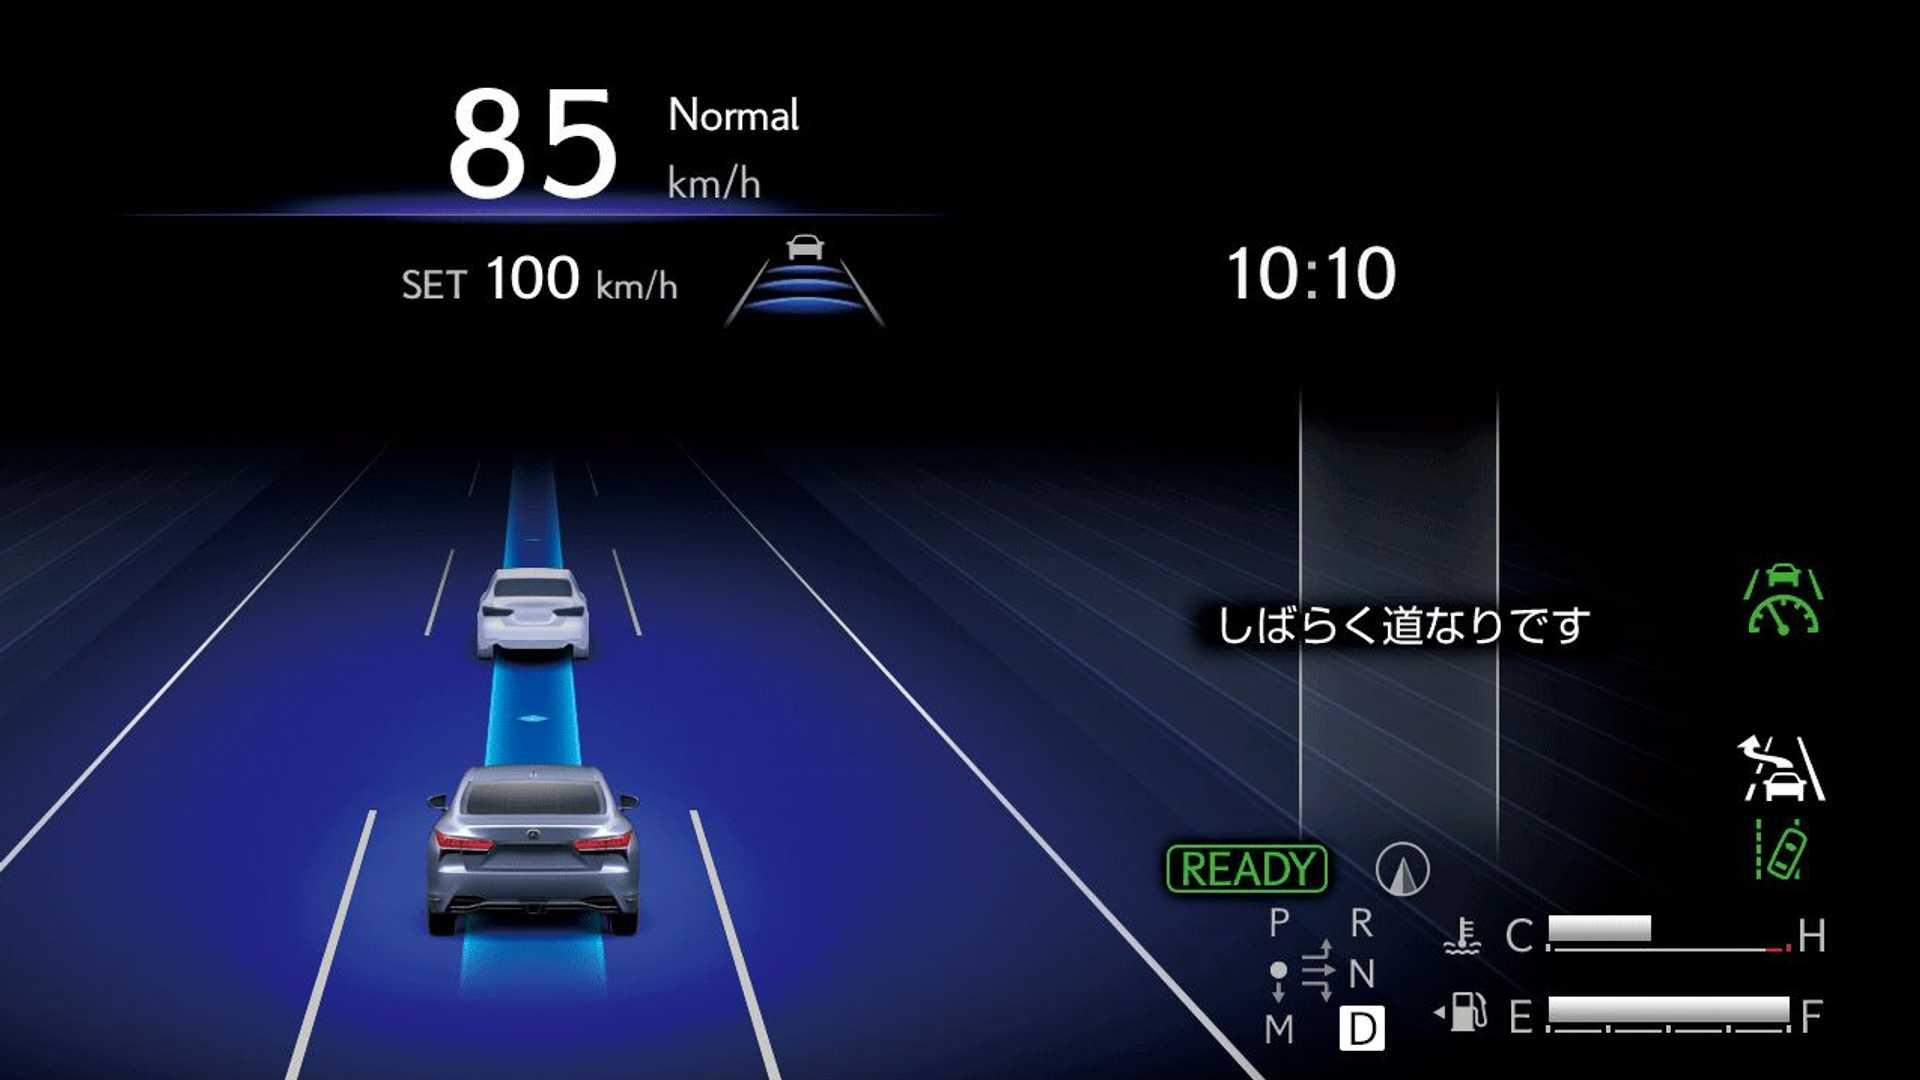 Lexus-LS-And-Toyota-Mirai-Advanced-Drive-15